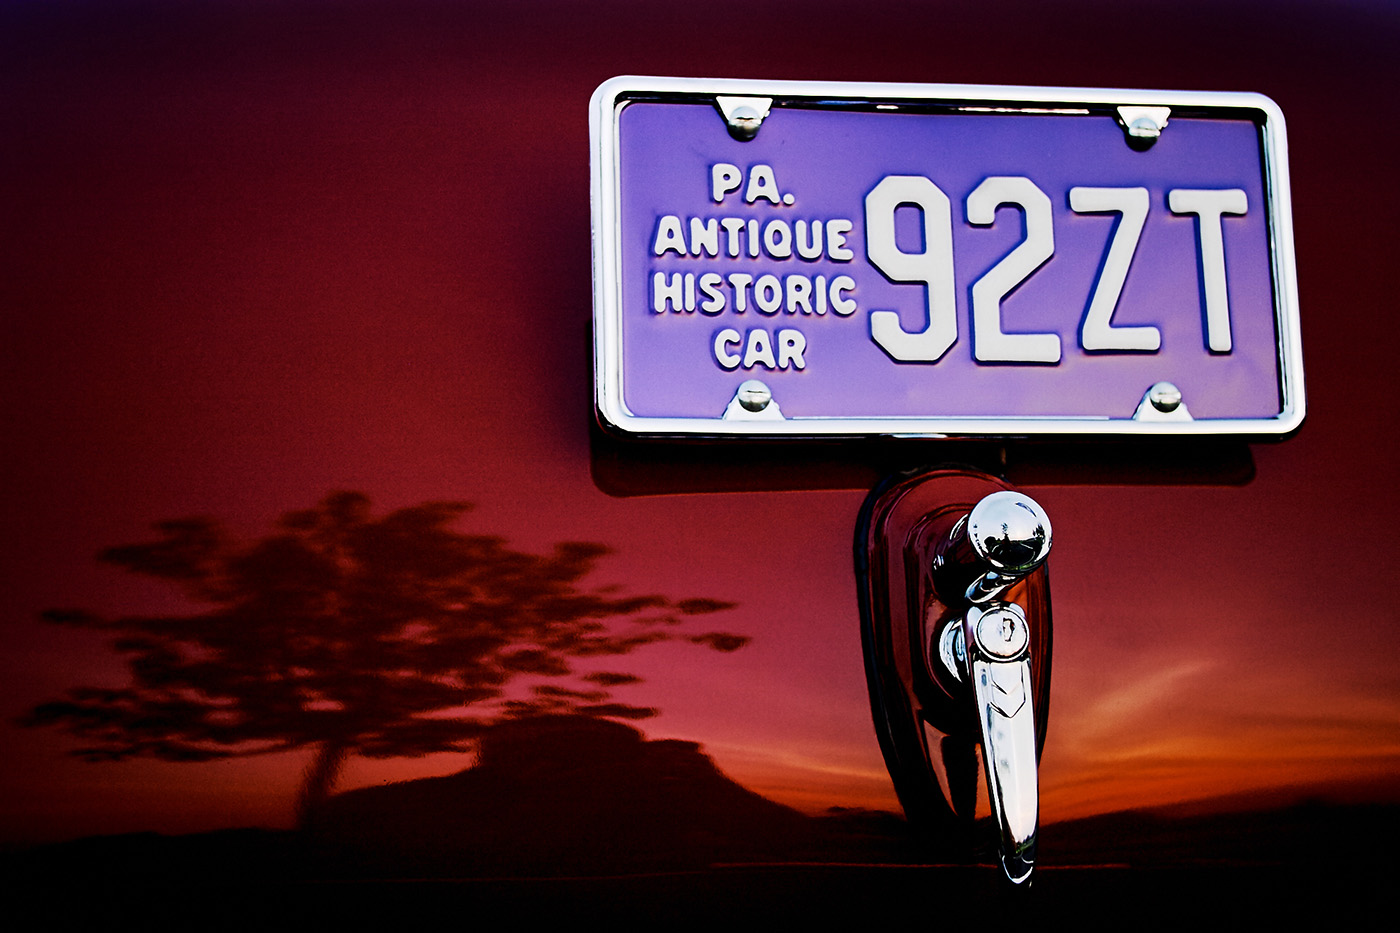 PA Antique Historic Car, Hampton, New Jersey